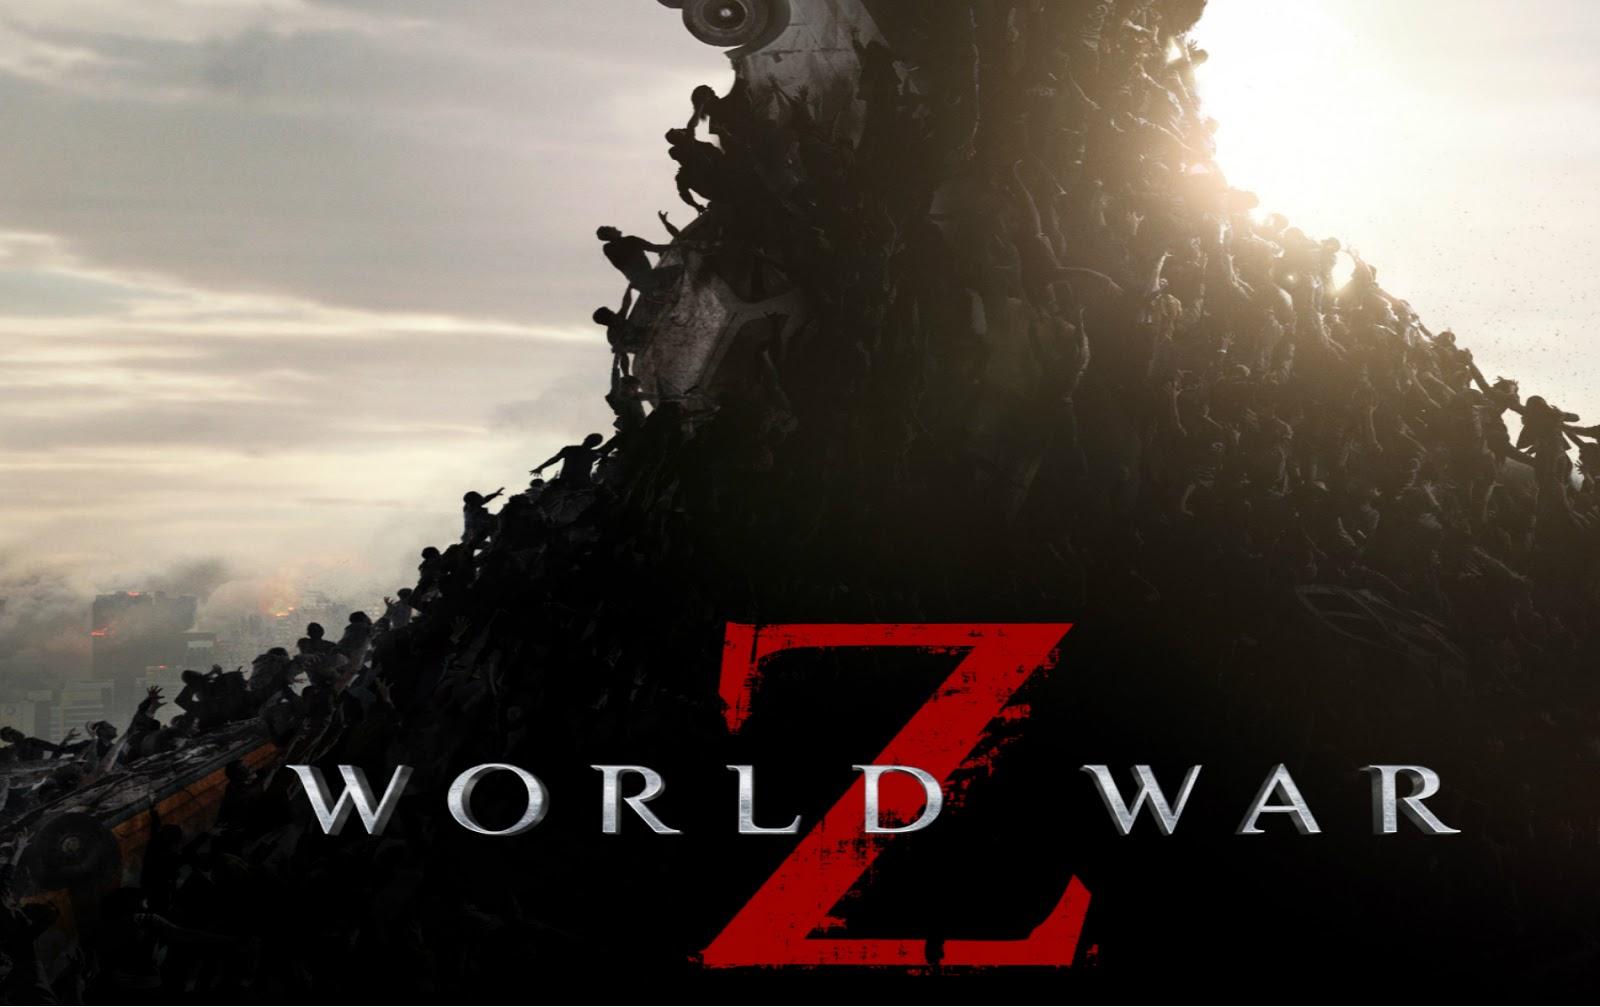 world war z movie font    please??? - forum | dafont com